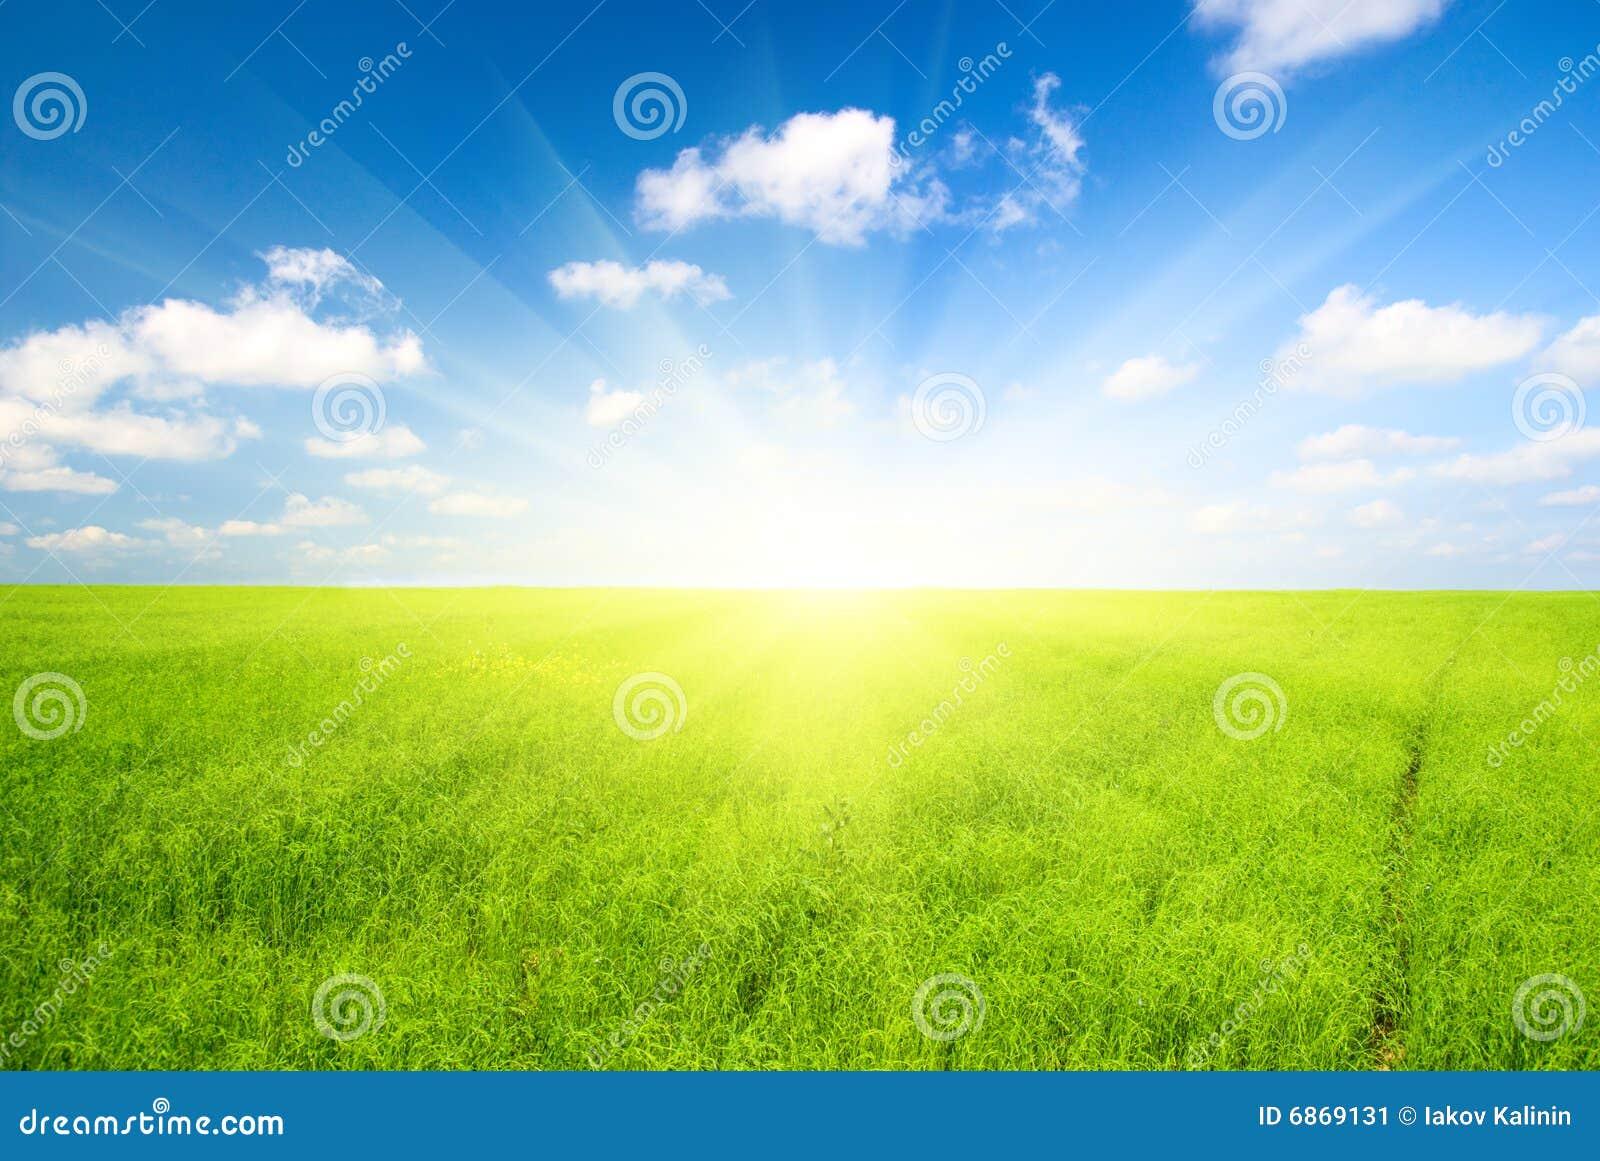 зеленый цвет льна поля